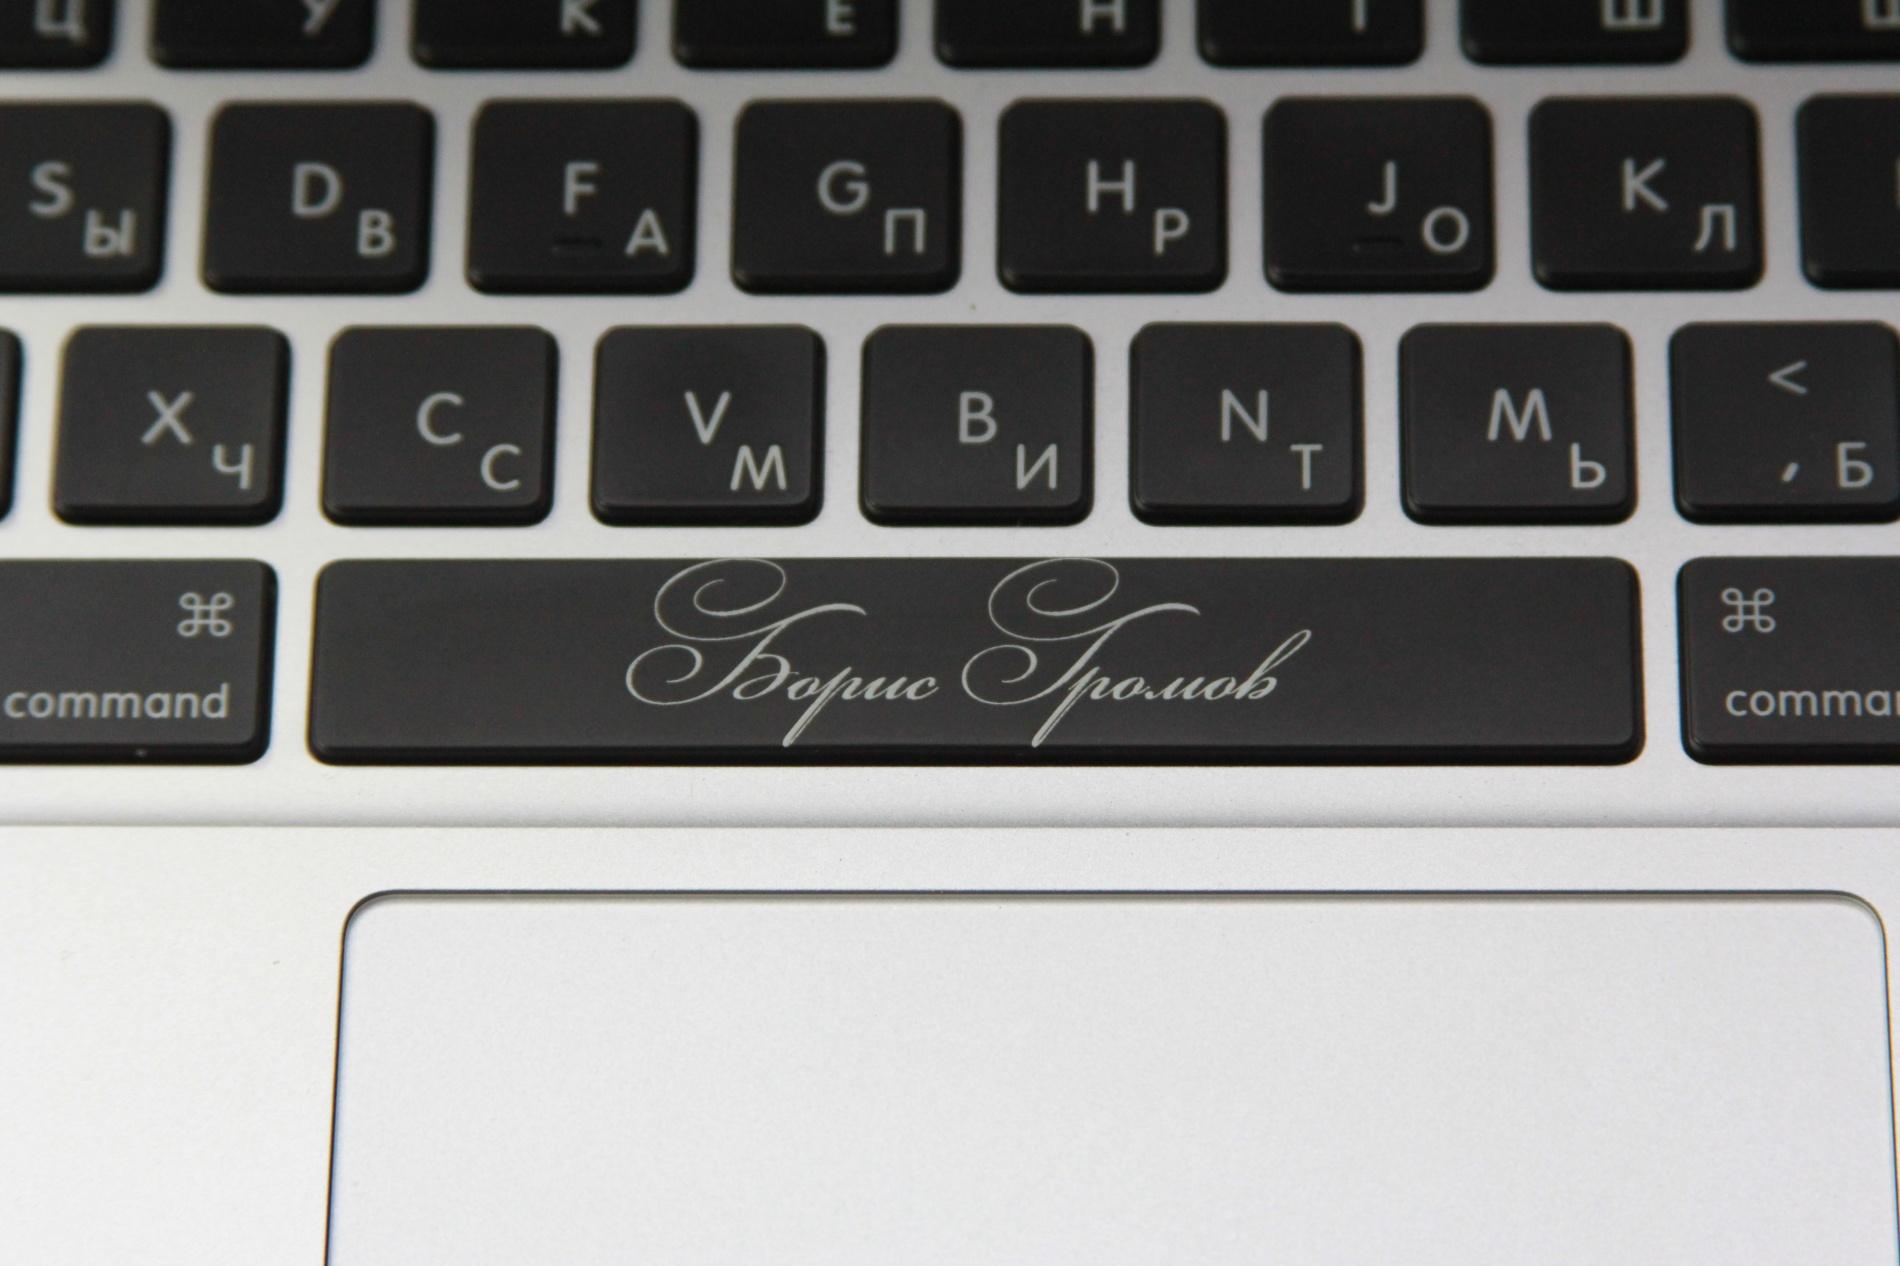 Клавиатура macbook гравировка - ремонт в Москве замена стекла в планшете минск